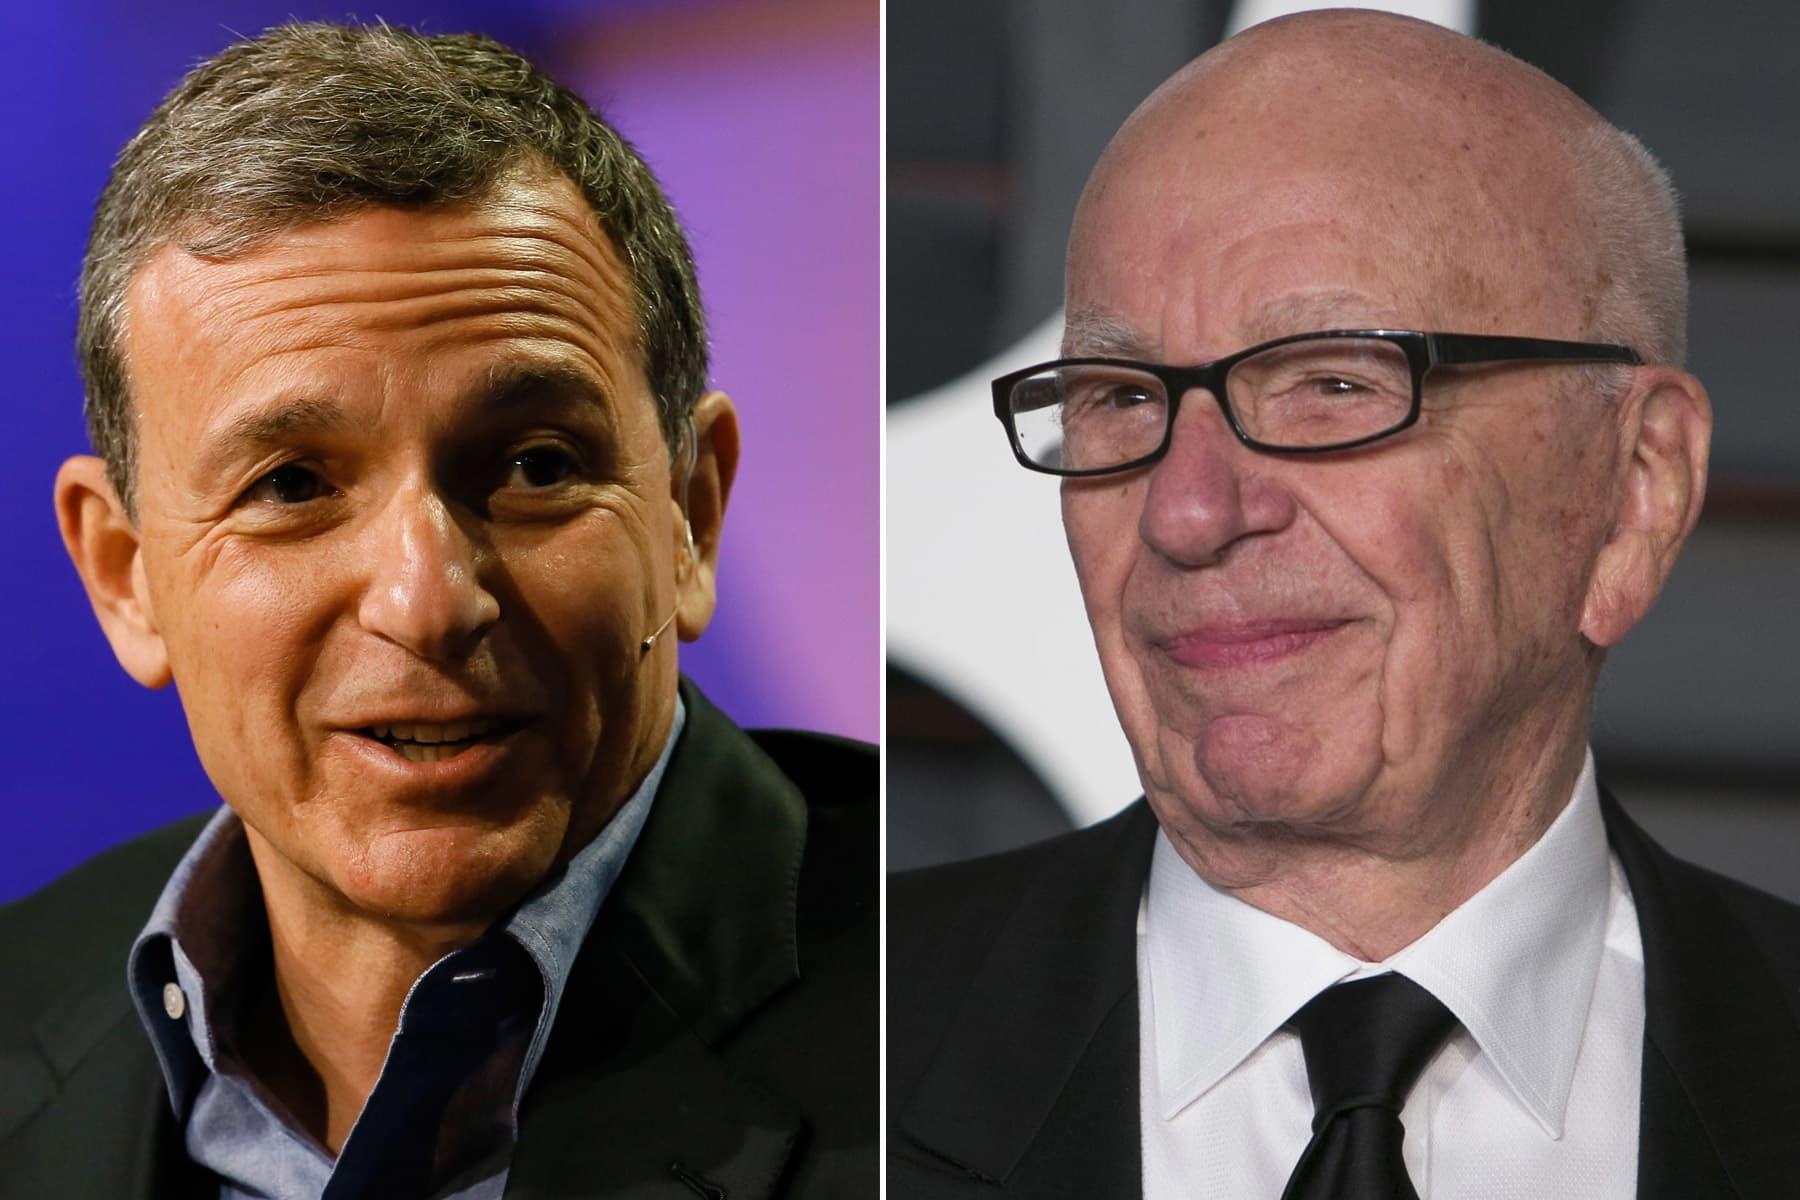 Premium: Bob Iger Rupert Murdoch split